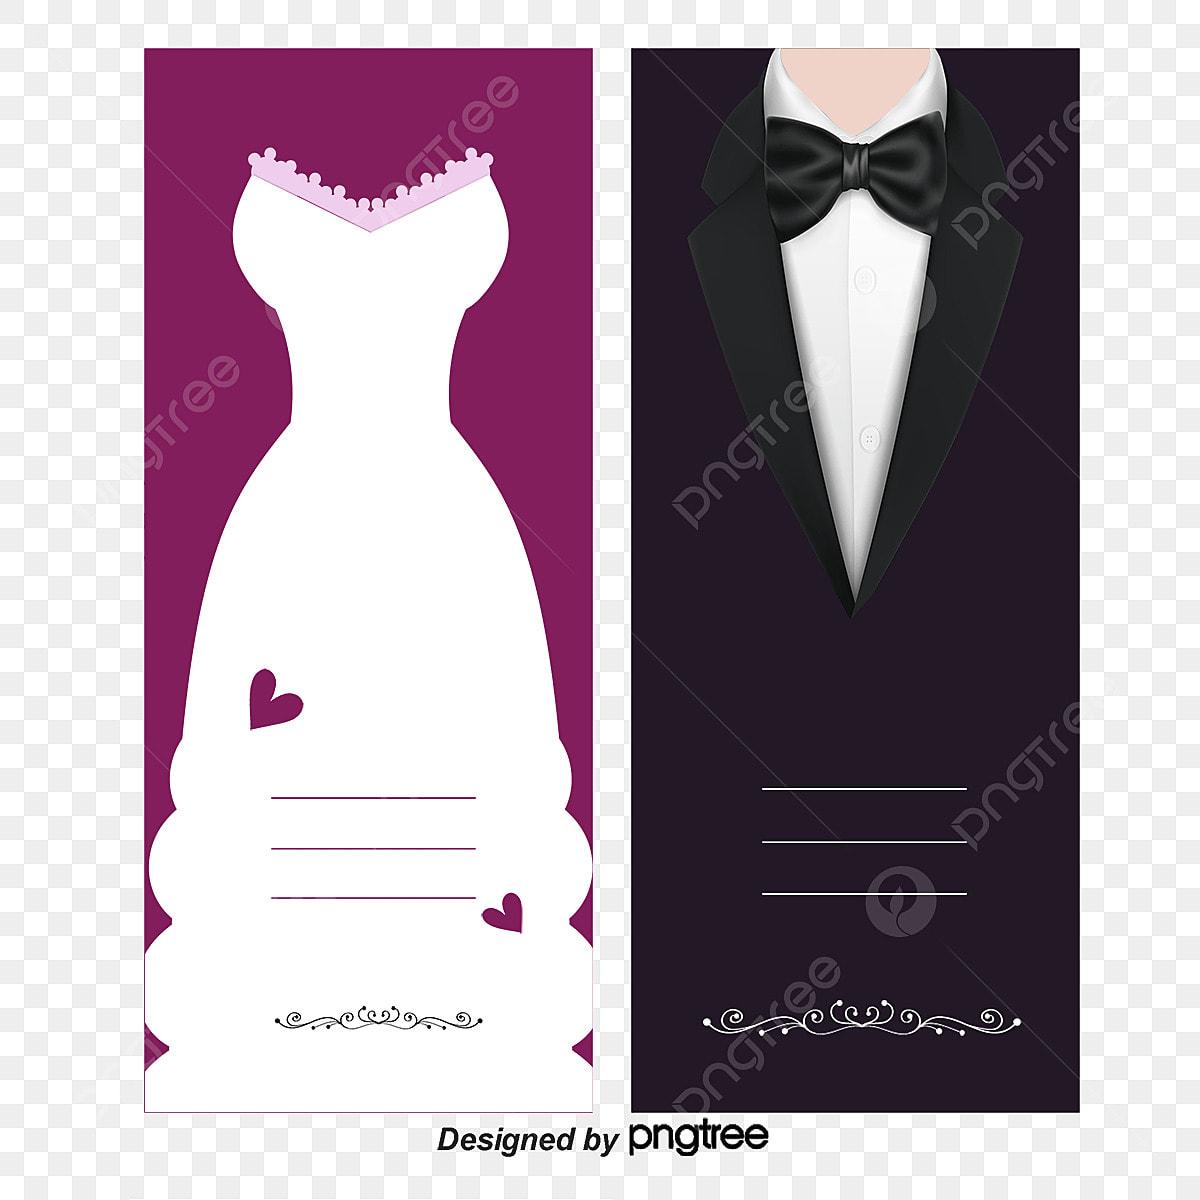 Invitations Invitation Card Wedding Invitations Invitations